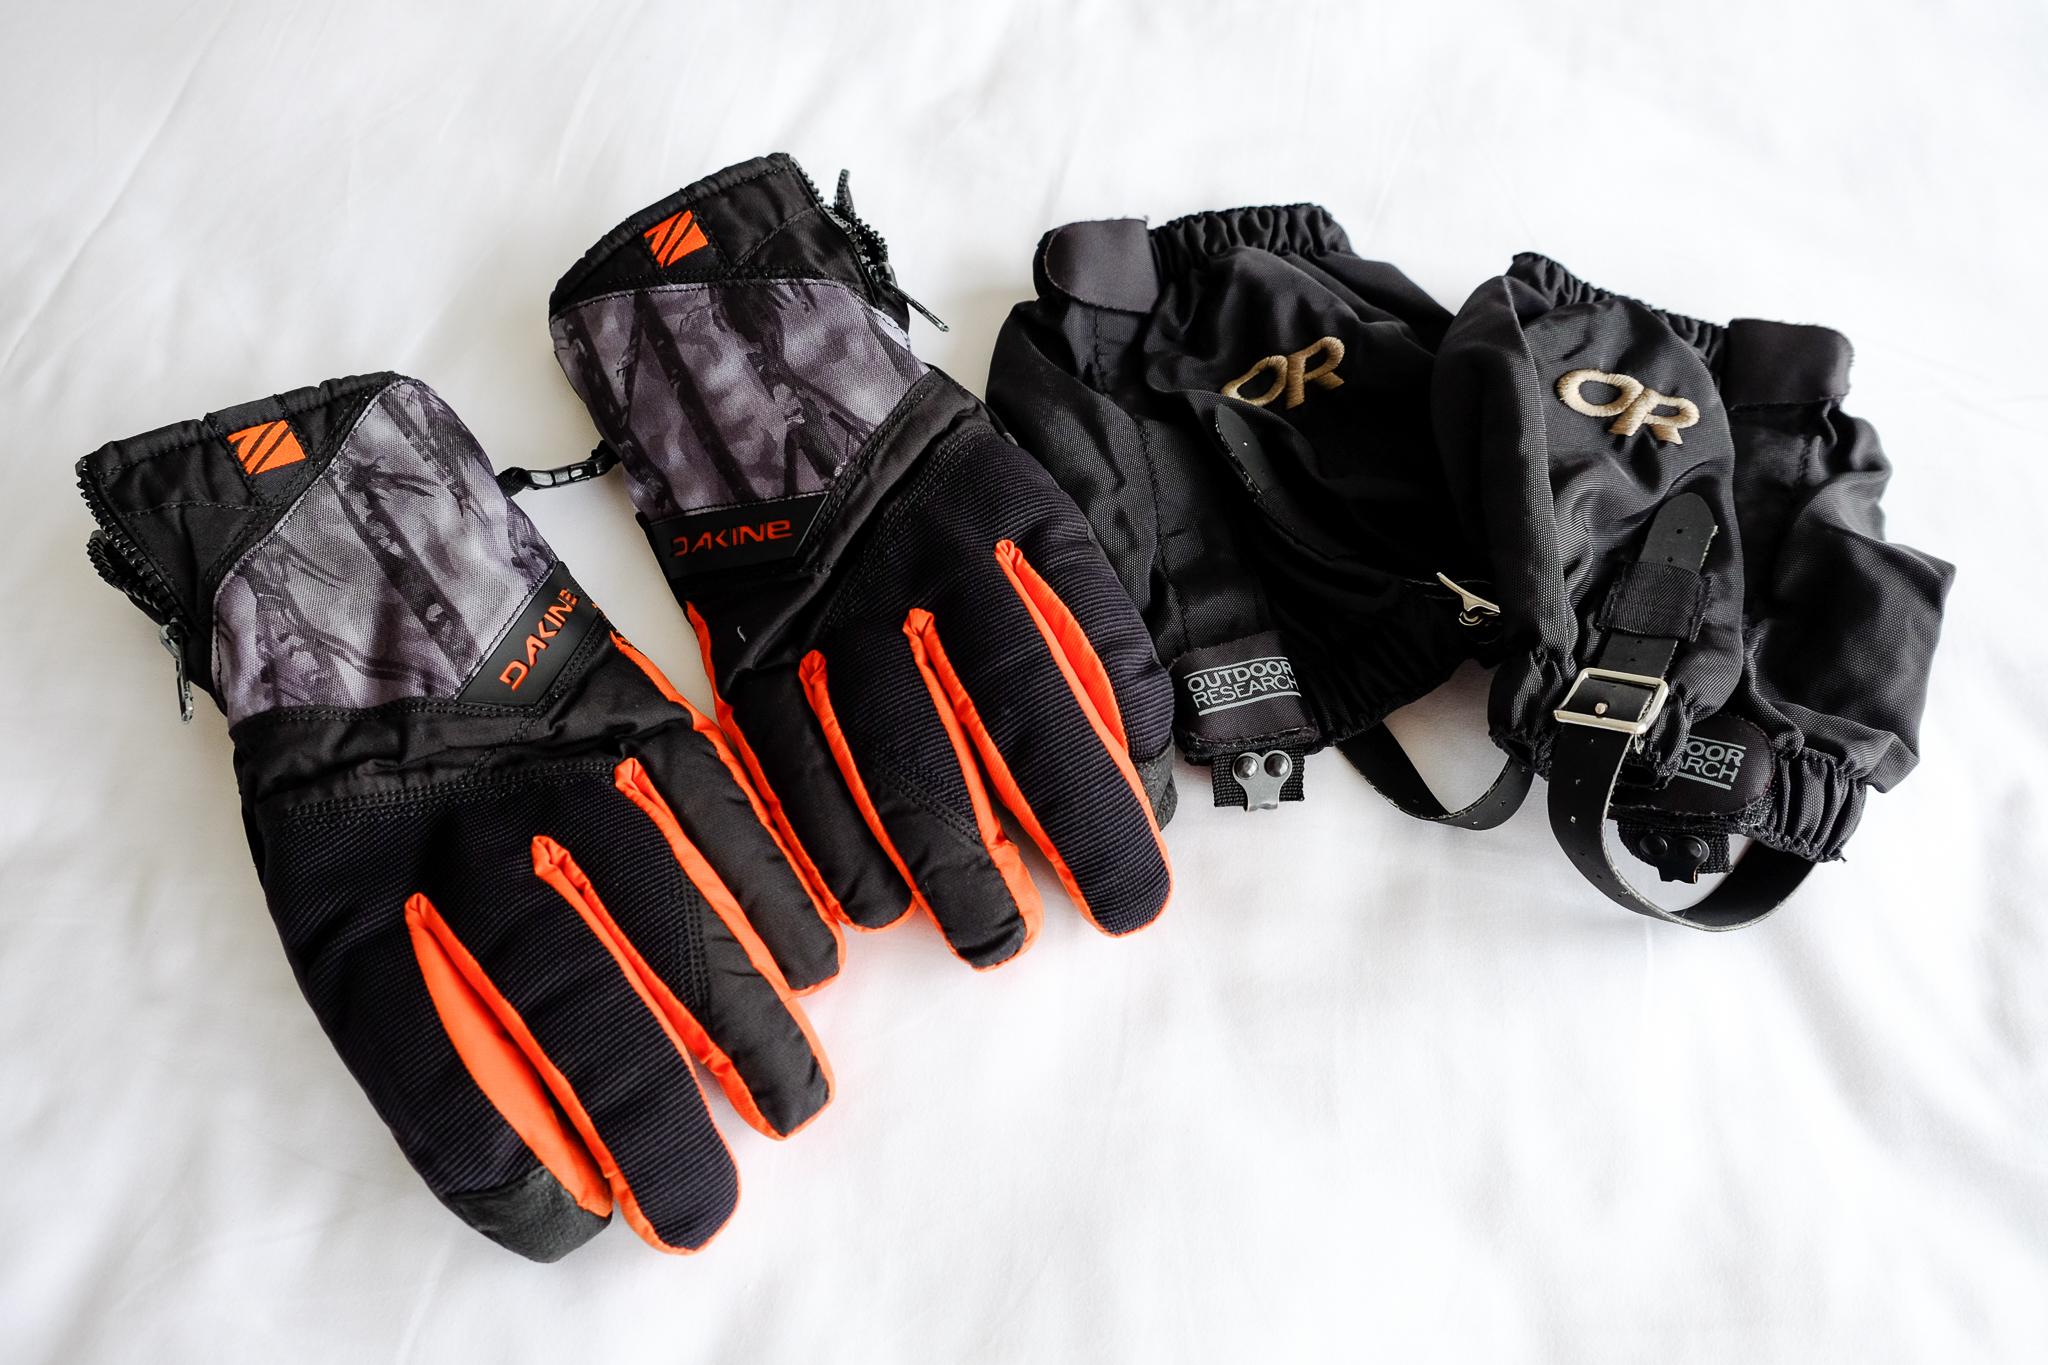 Dakine Bronco Gore-tex Gloves  &  Outdoor Research Rocky Mountain Low Gaiters